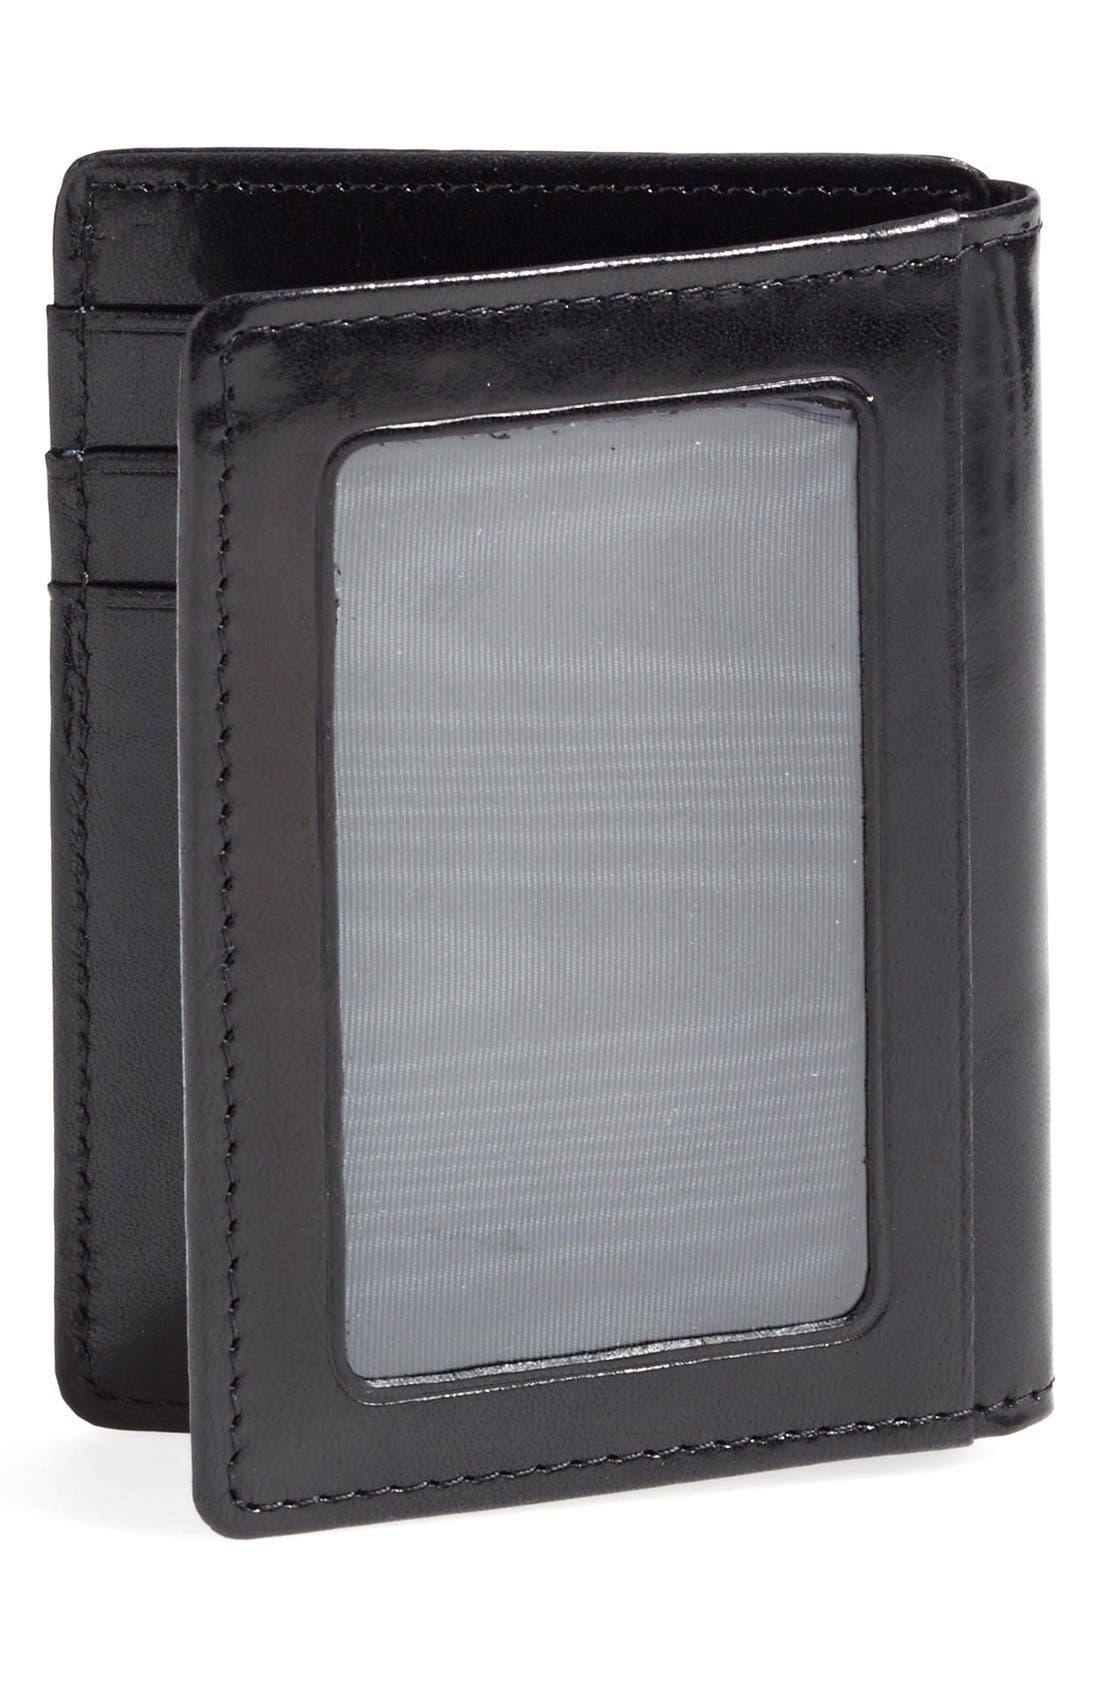 Alternate Image 3  - Bosca 'Old Leather' Front Pocket ID Wallet